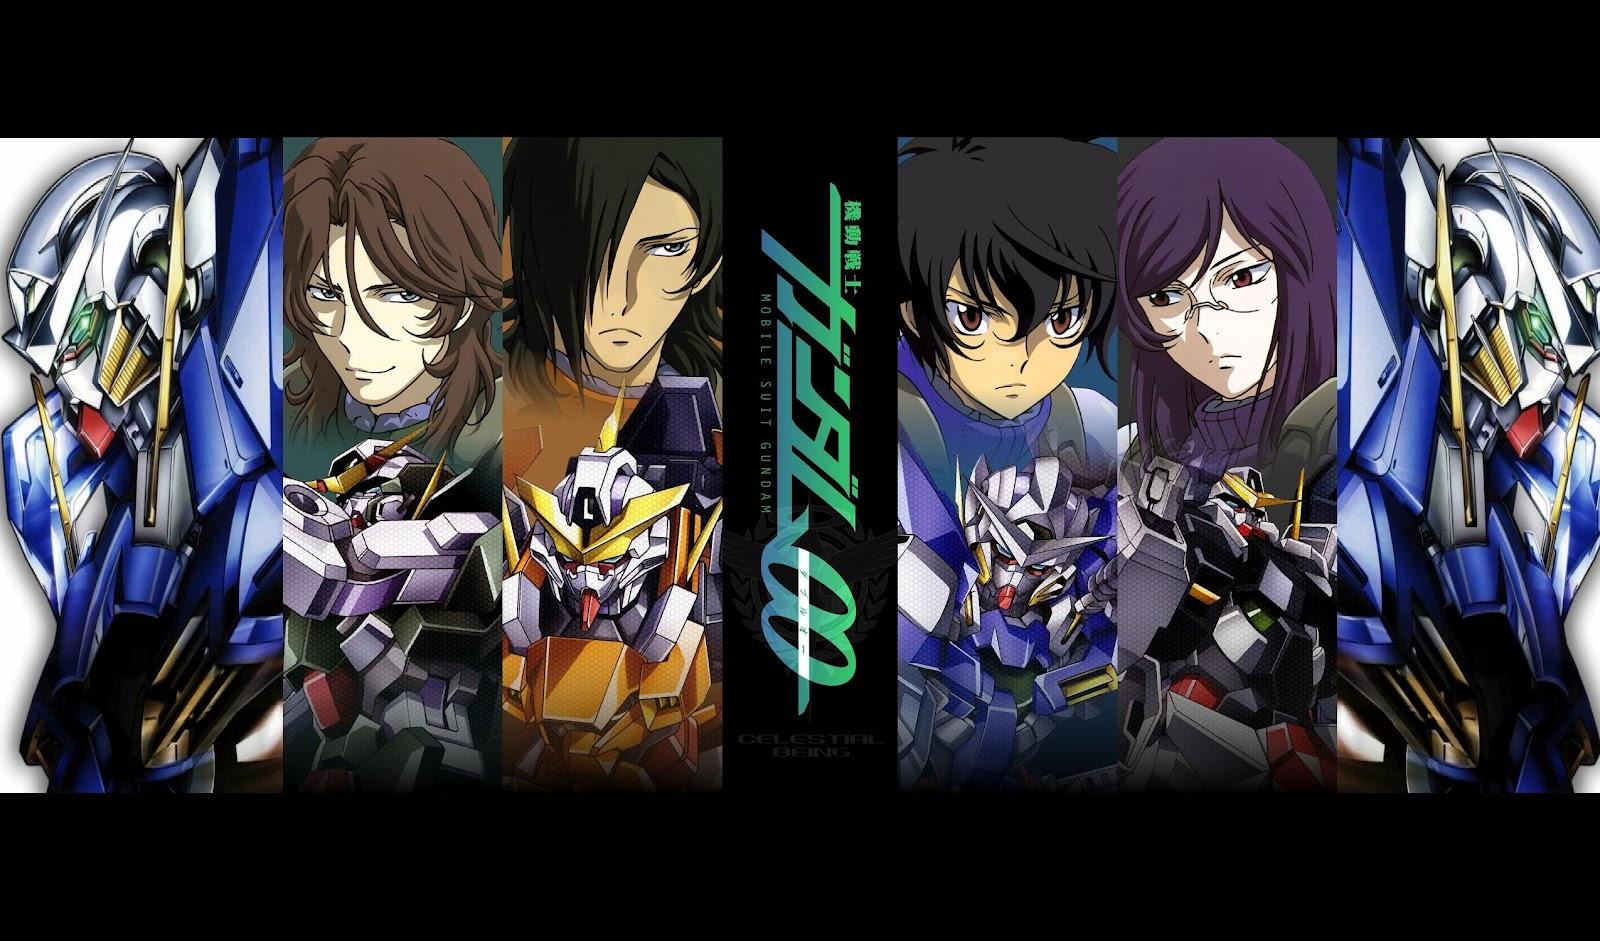 Amazing Mobile Suit Gundam 00 Dynames Wallpaper Illustration